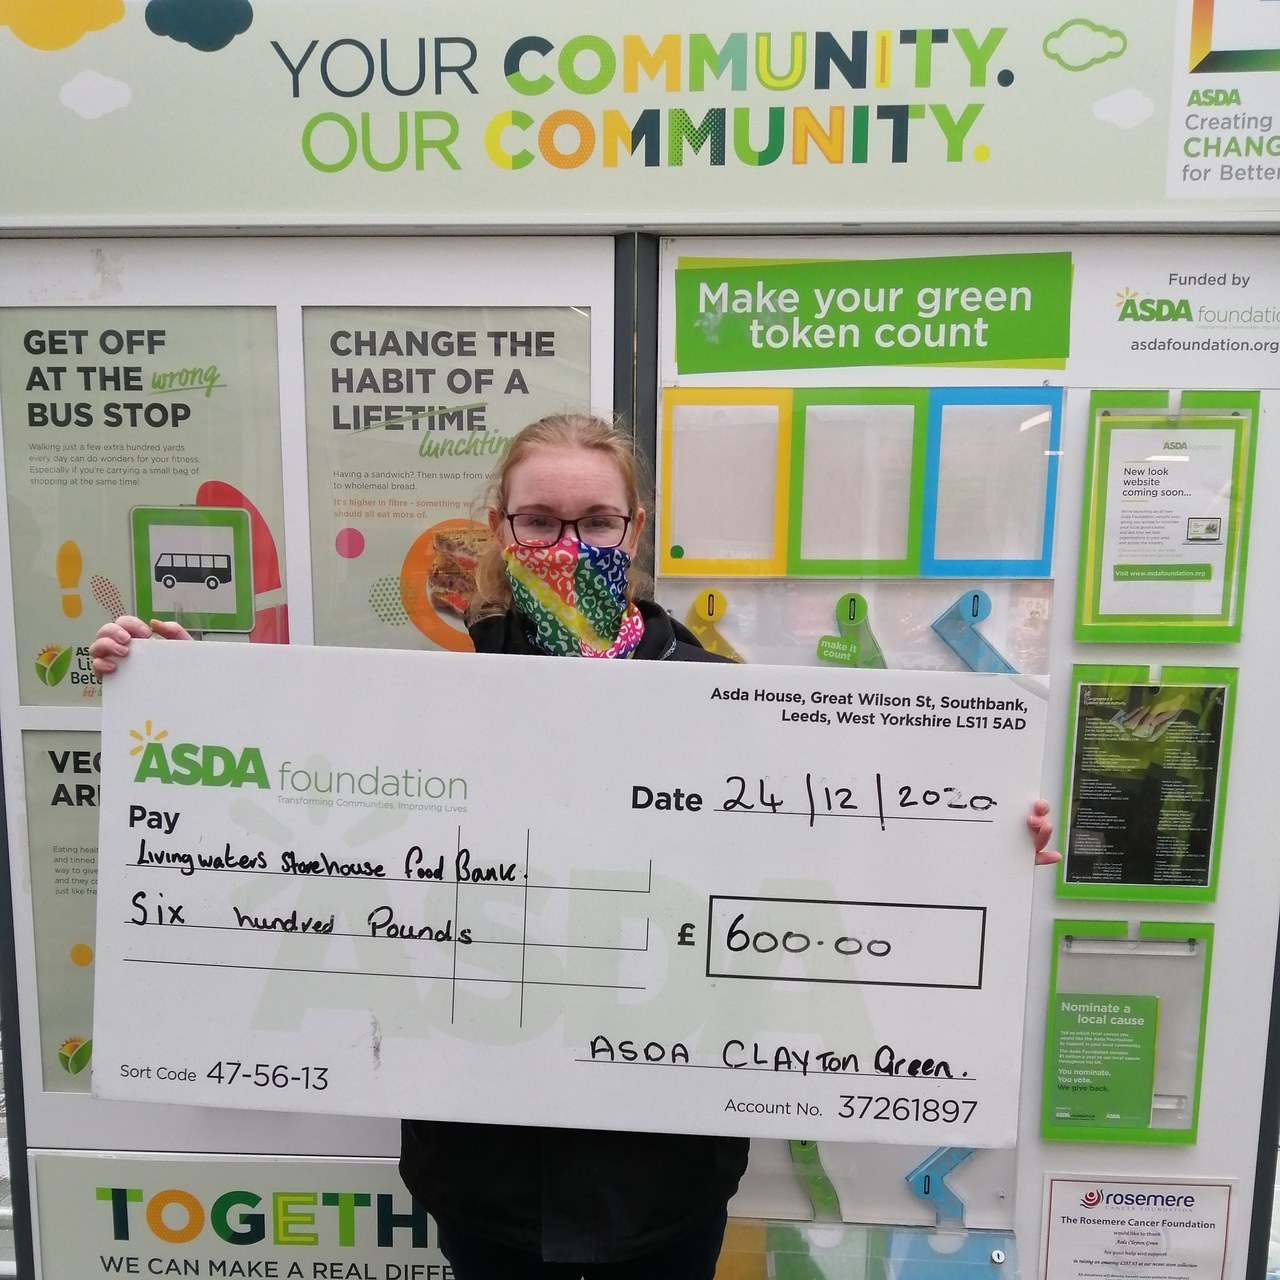 Foundation grant helps local food bank | Asda Clayton Green